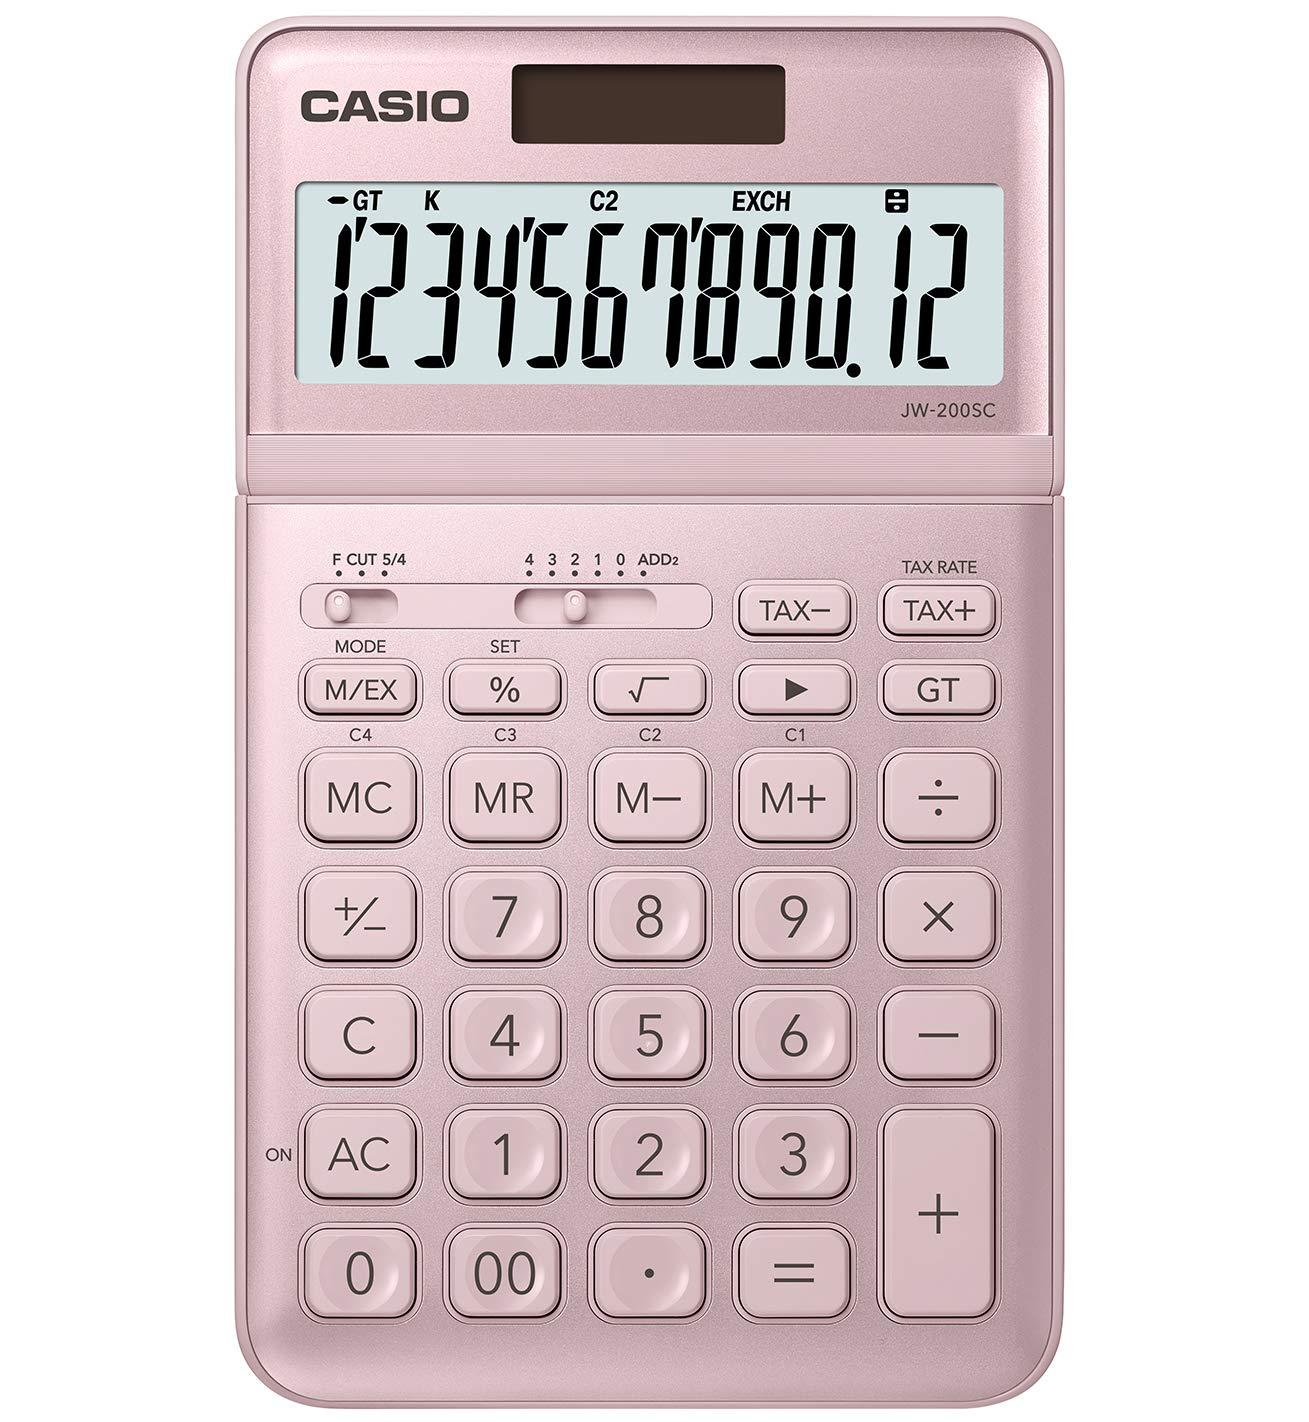 CASIO JW-200SC 12-Digit Calculator, Tax & Exchange, Dual Powe Professional Percentage Calculation (Pink)